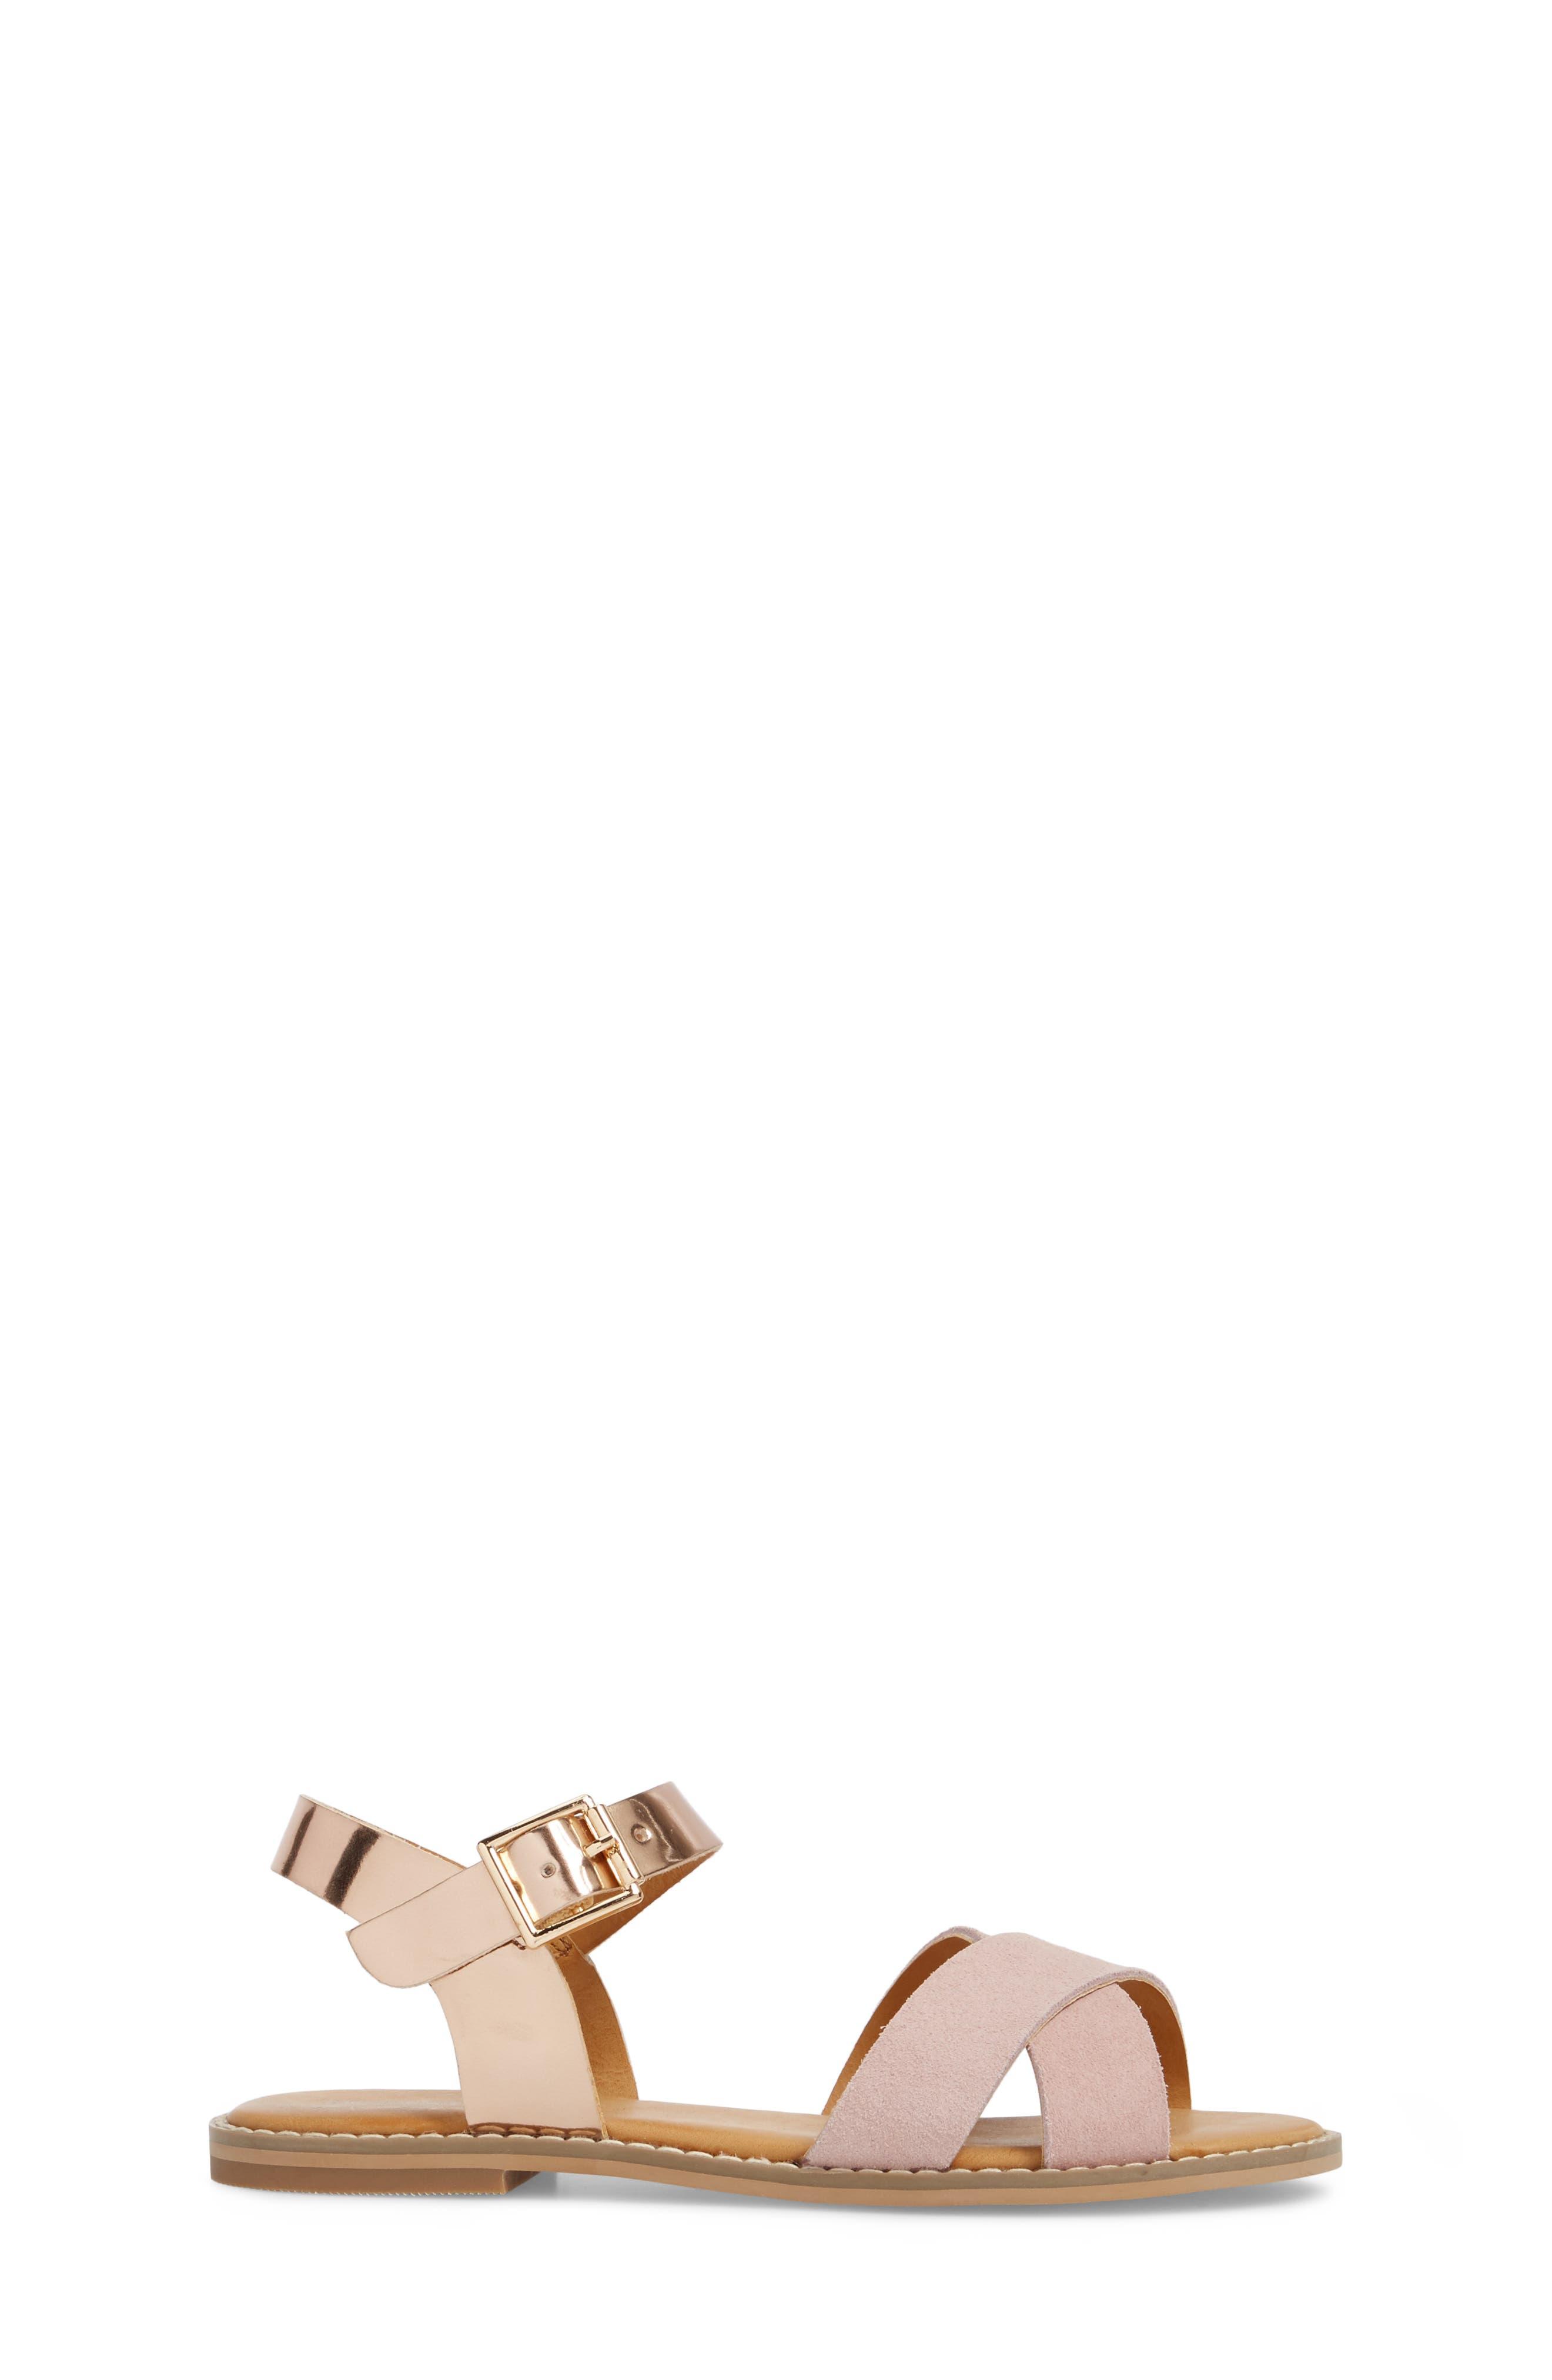 Arya Cross Strap Sandal,                             Alternate thumbnail 4, color,                             Rose Gold Faux Lea